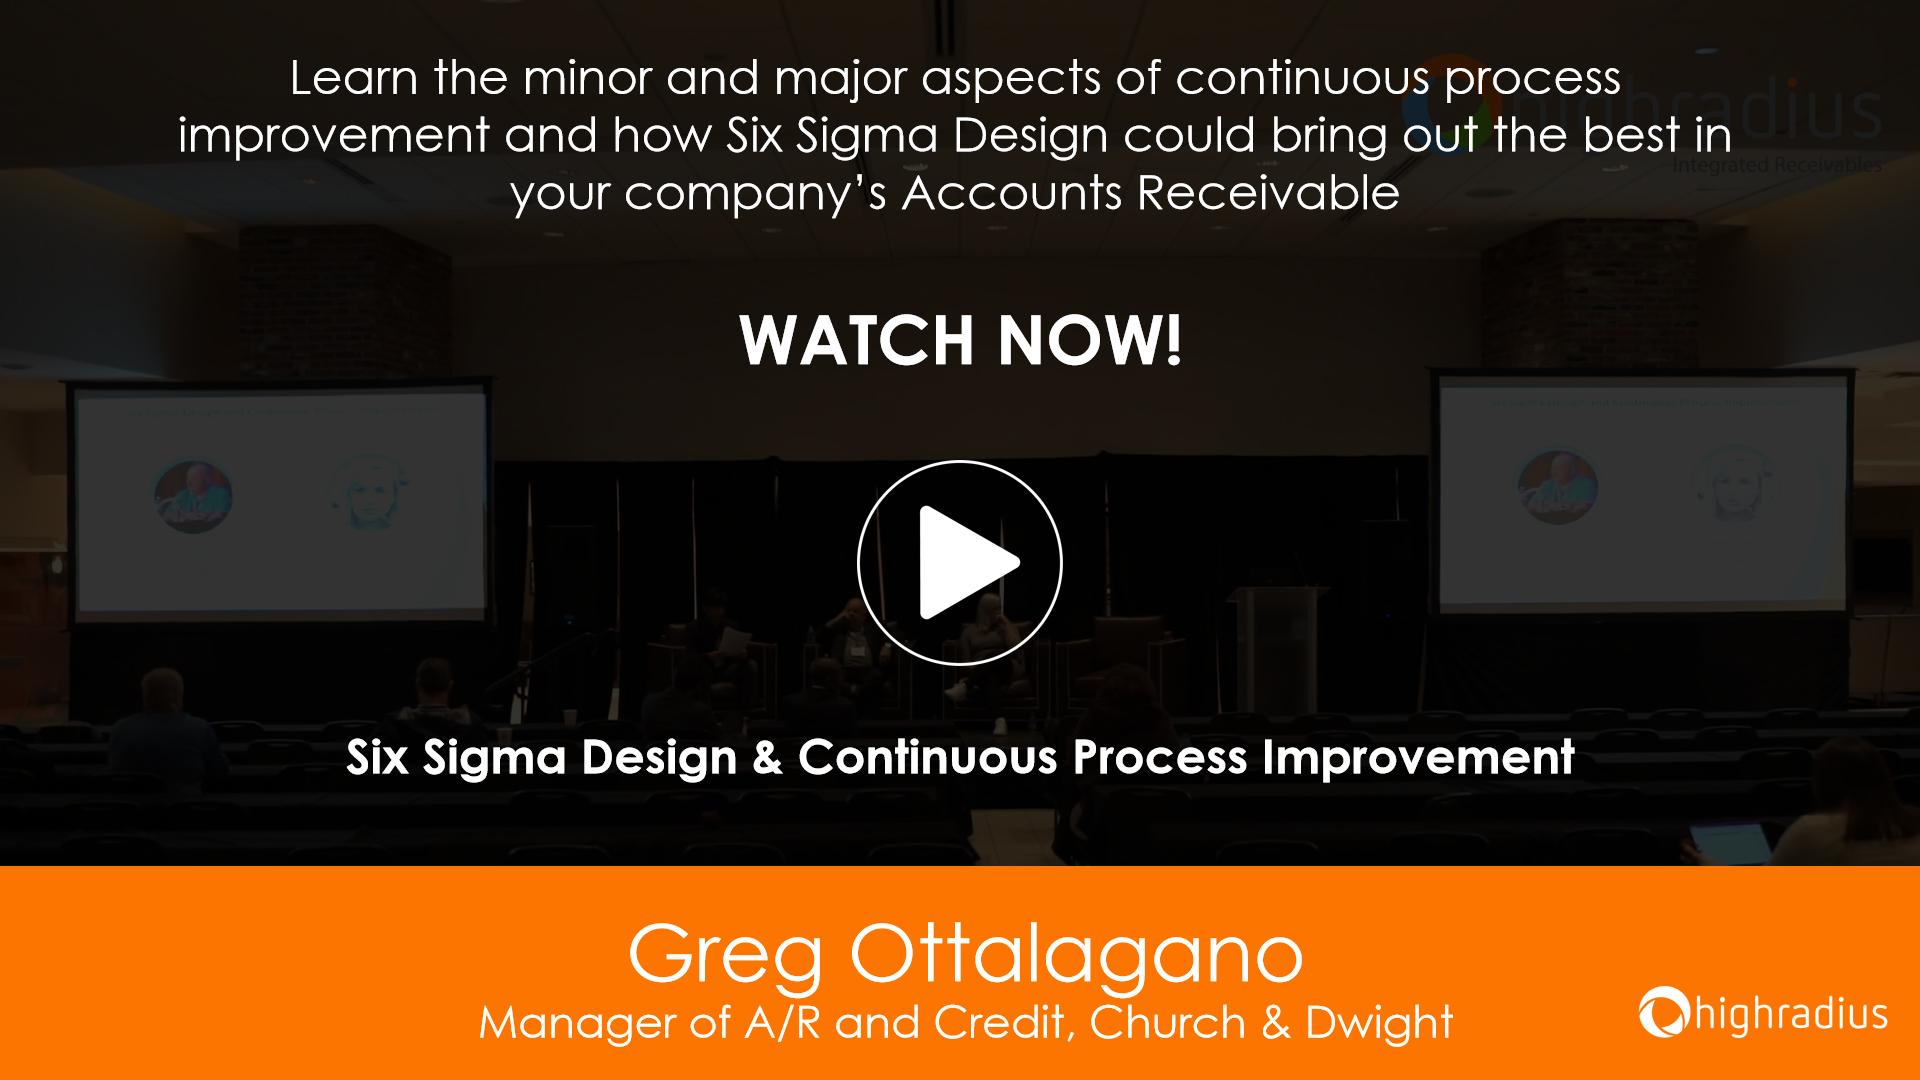 Six Sigma Design & Continuous Process Improvement